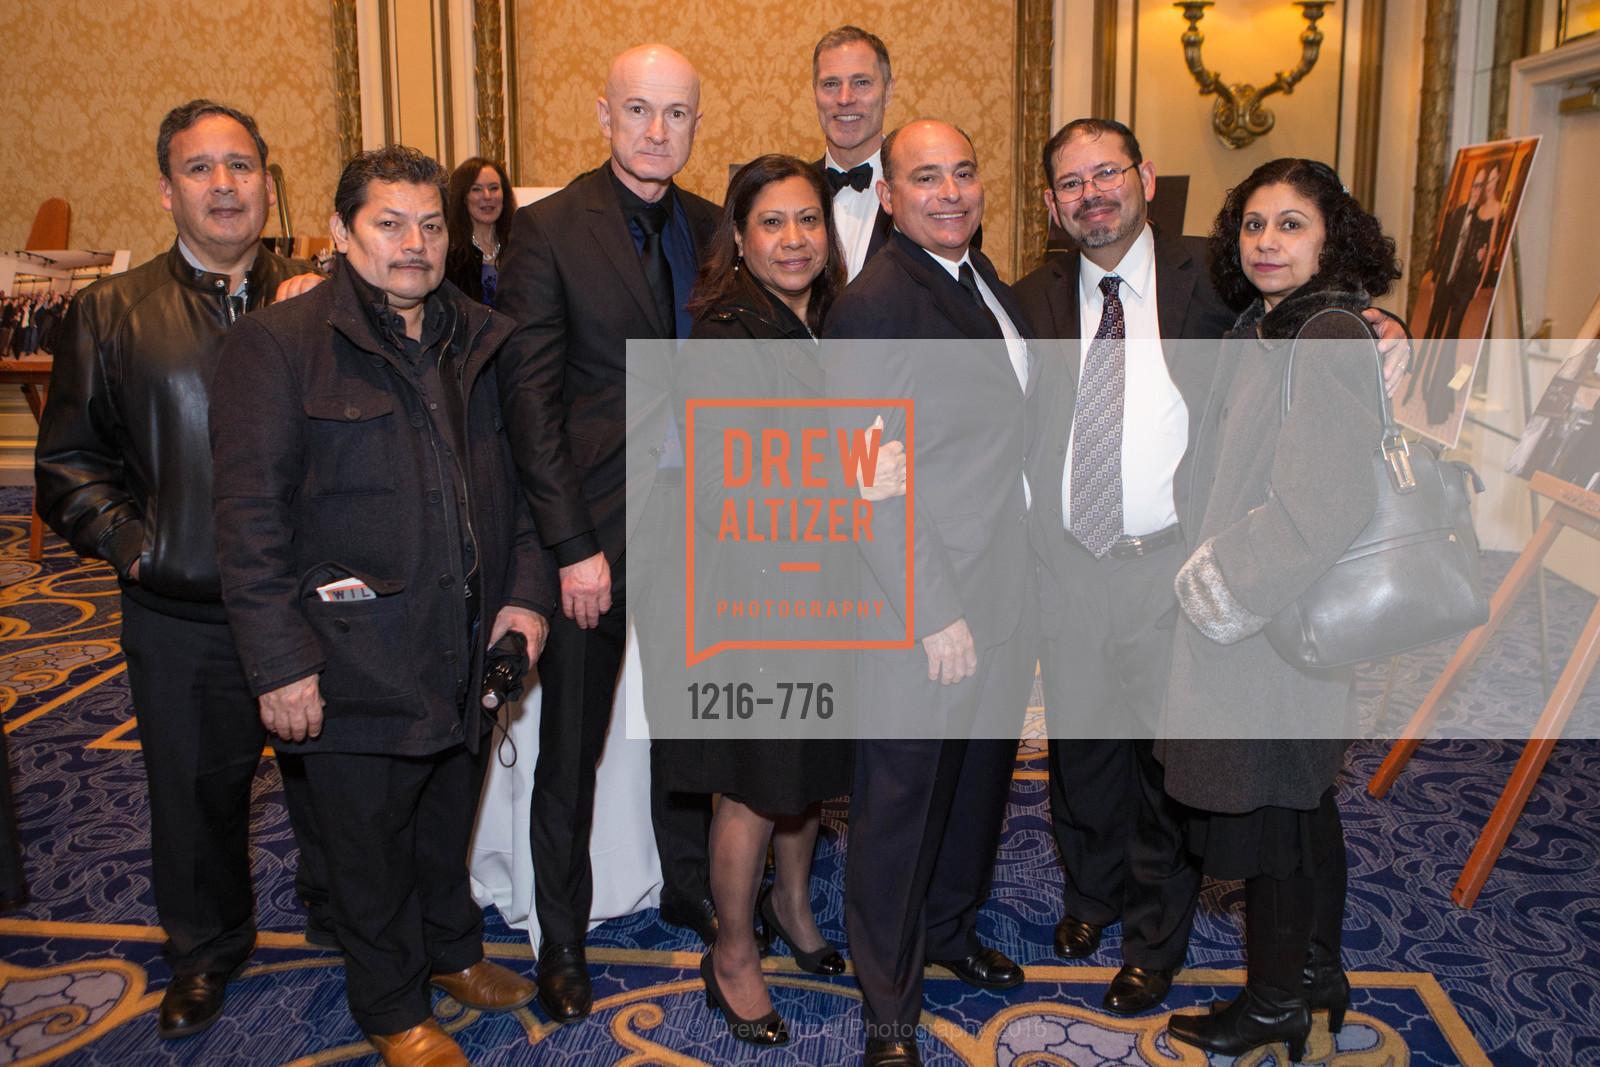 Manuel Marquez, Ramon Ramero, Mehmet Turudu, Angela Boteo, Armando Boteo, Randy Candler, Uriel Ojeda, Patricia Ojeda, Photo #1216-776